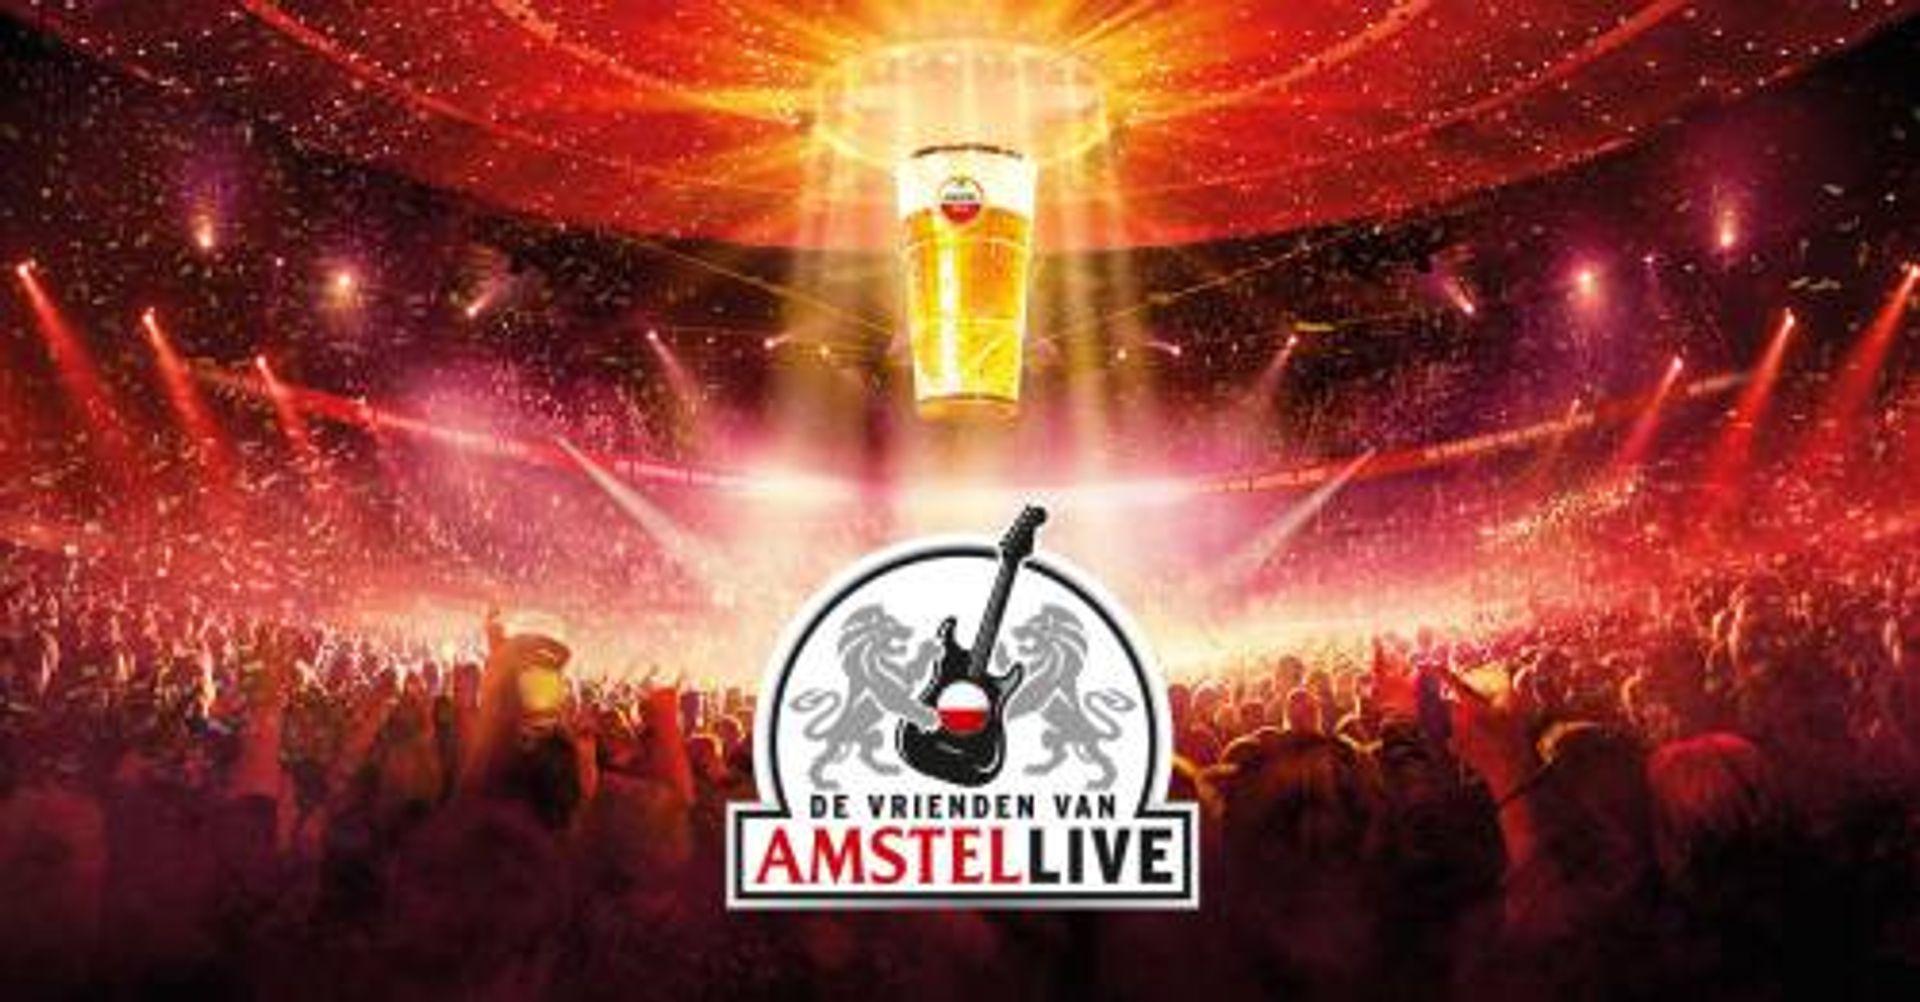 amstel live